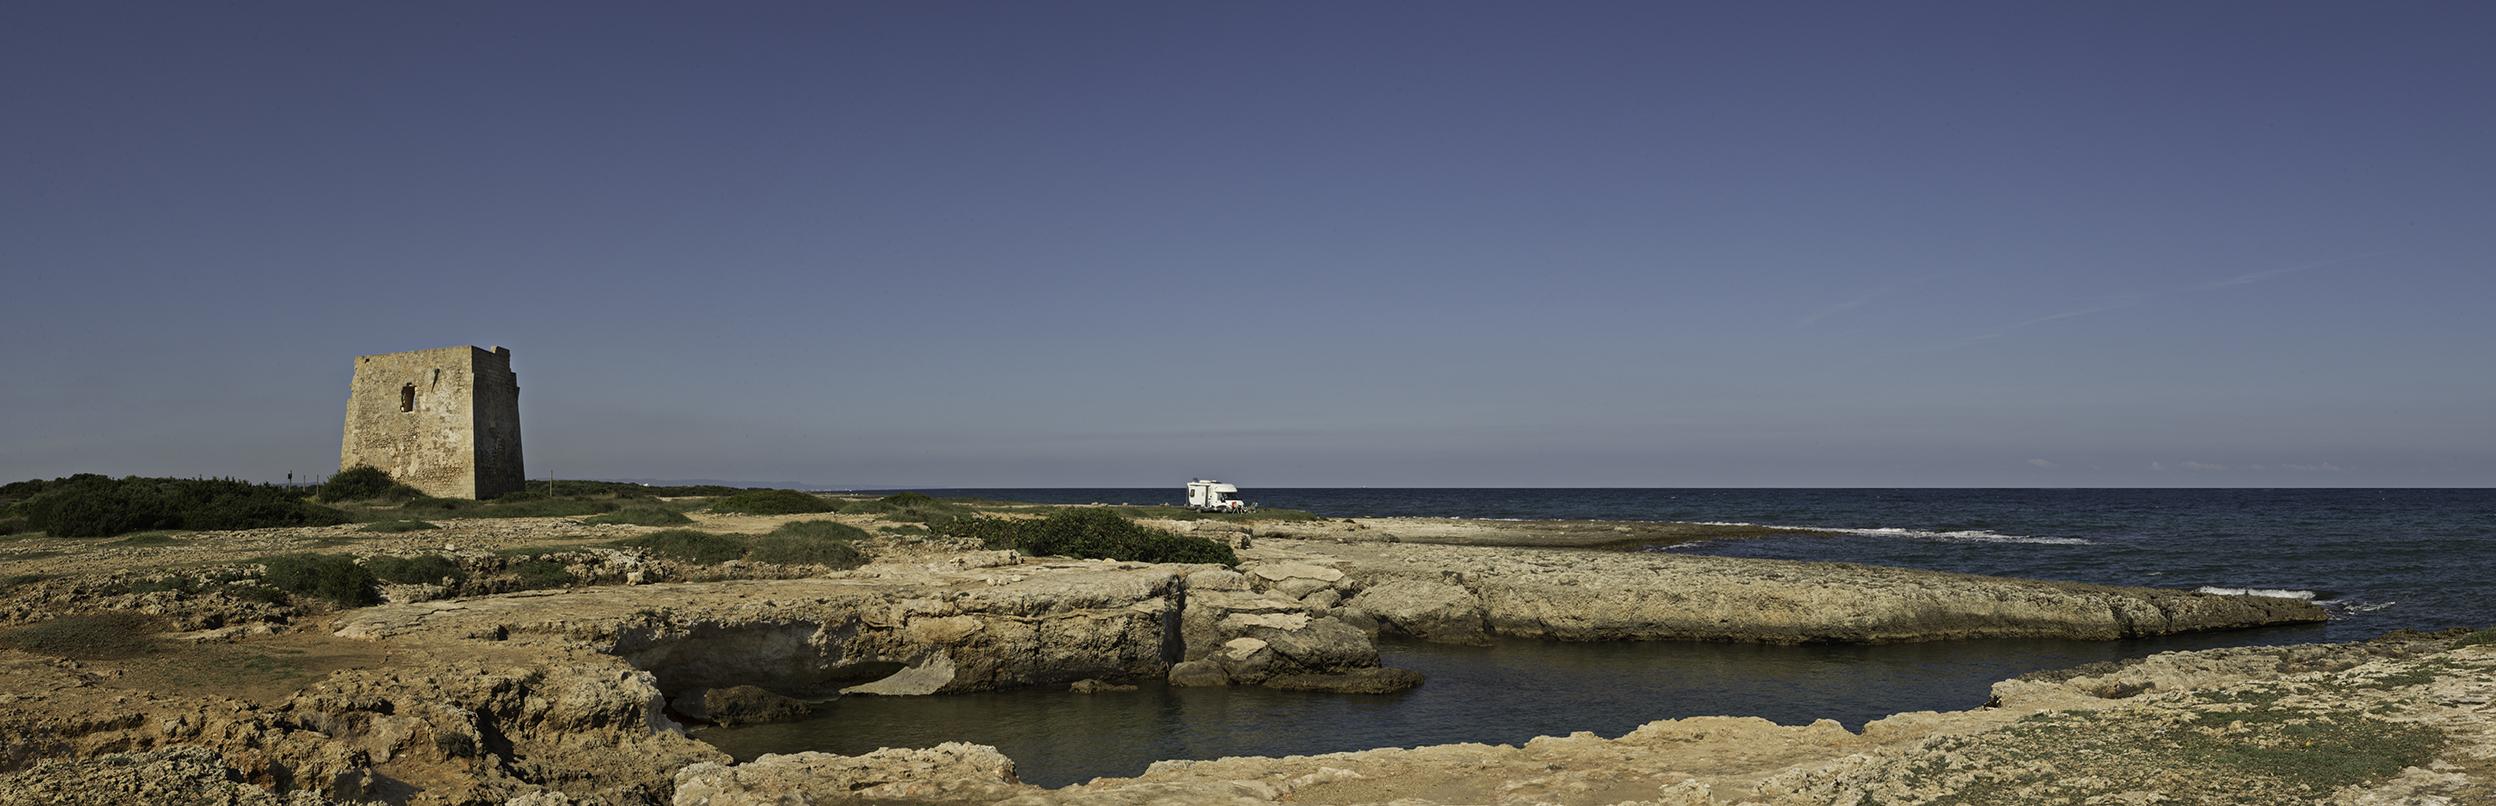 Adriatic Campers